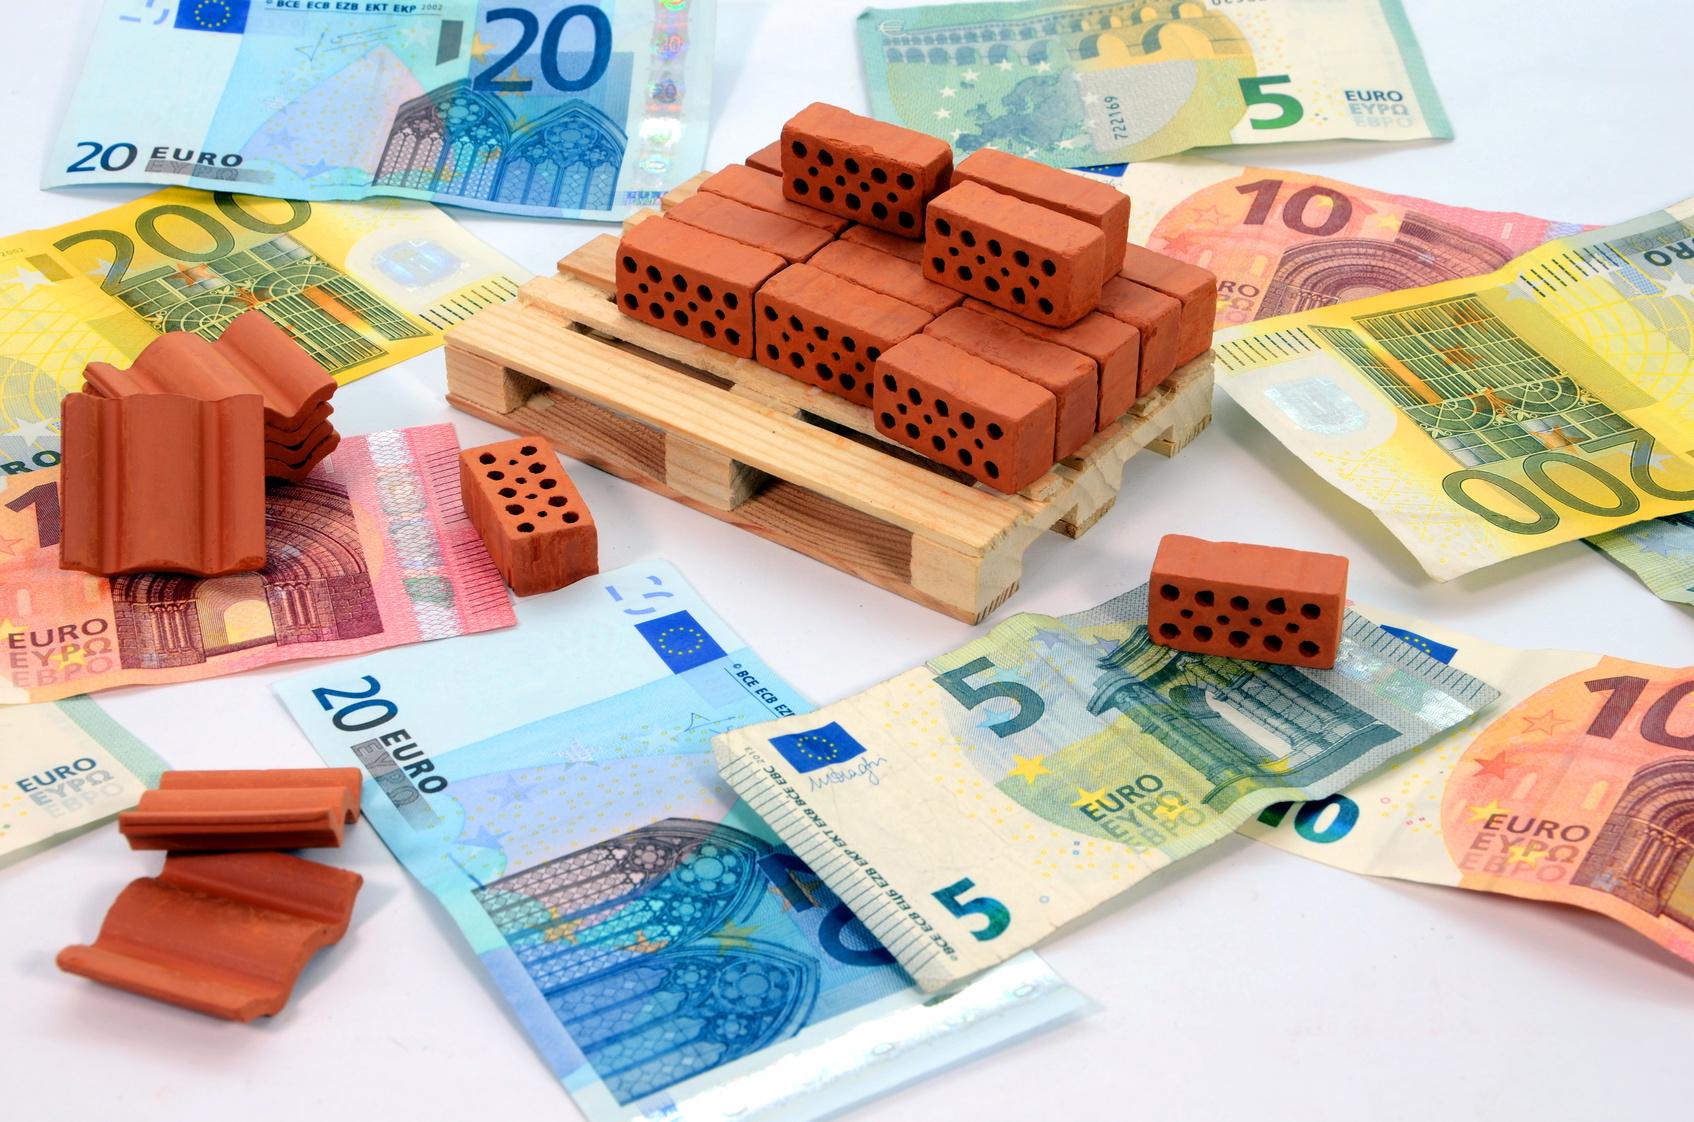 Wien: Wohnbauförderung neu